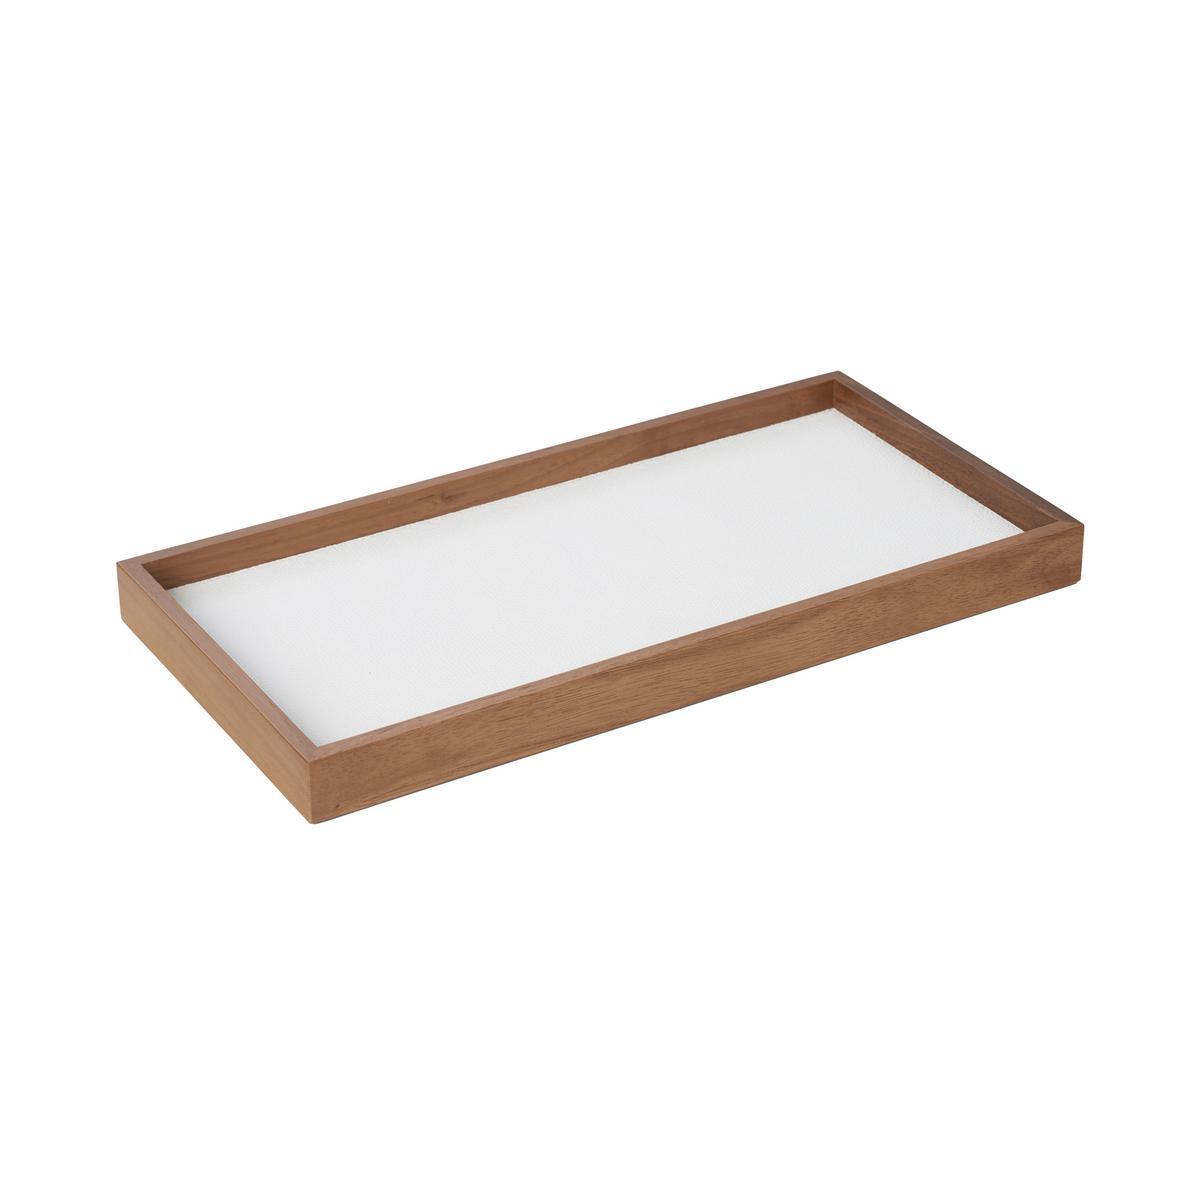 GioBagnara Phorma Rectangular tray rectangular small white